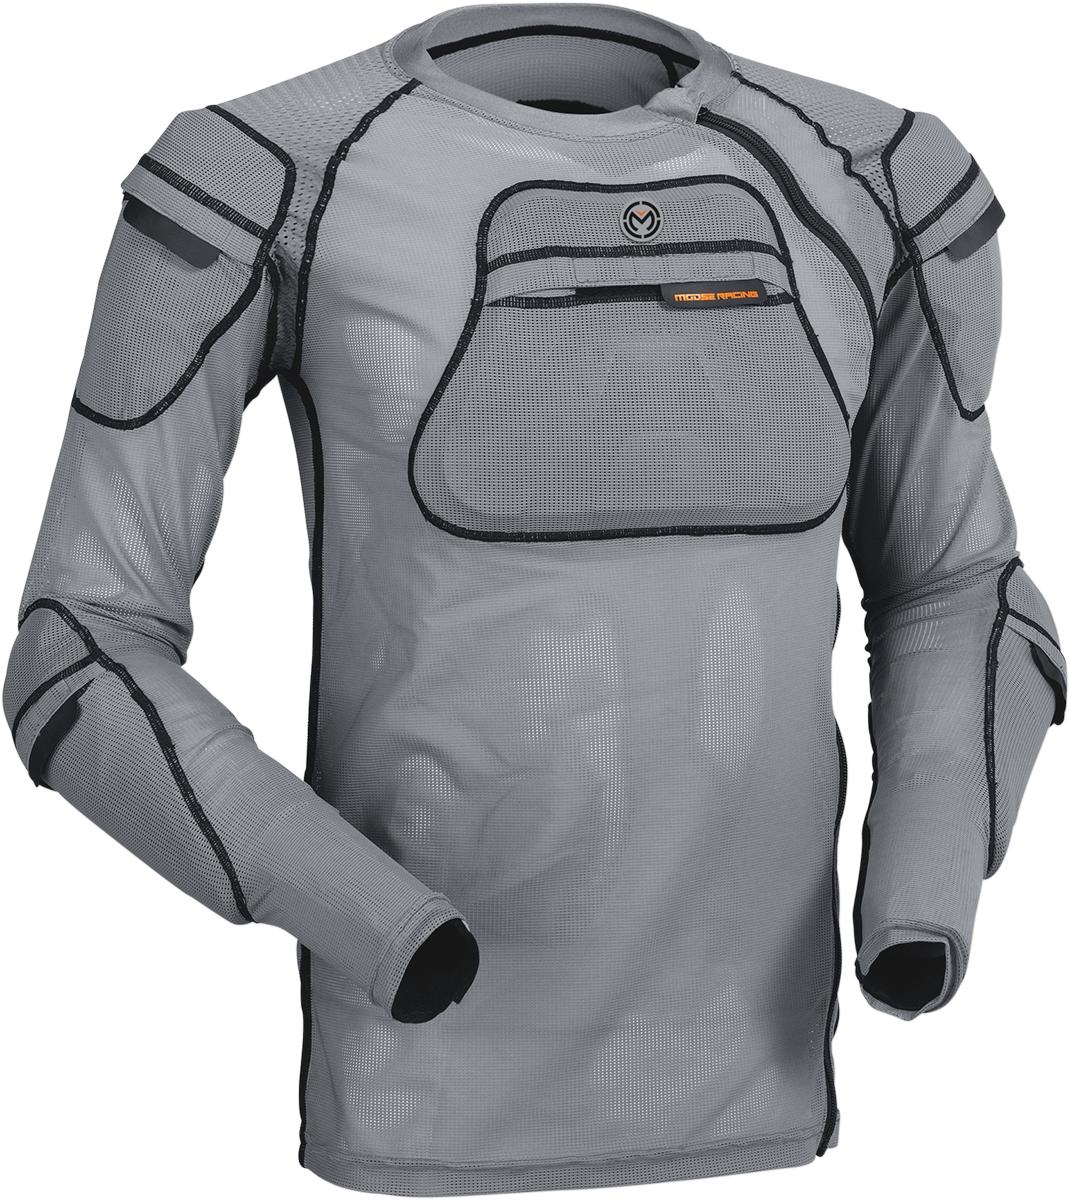 Moose Racing XC1 Body Armor